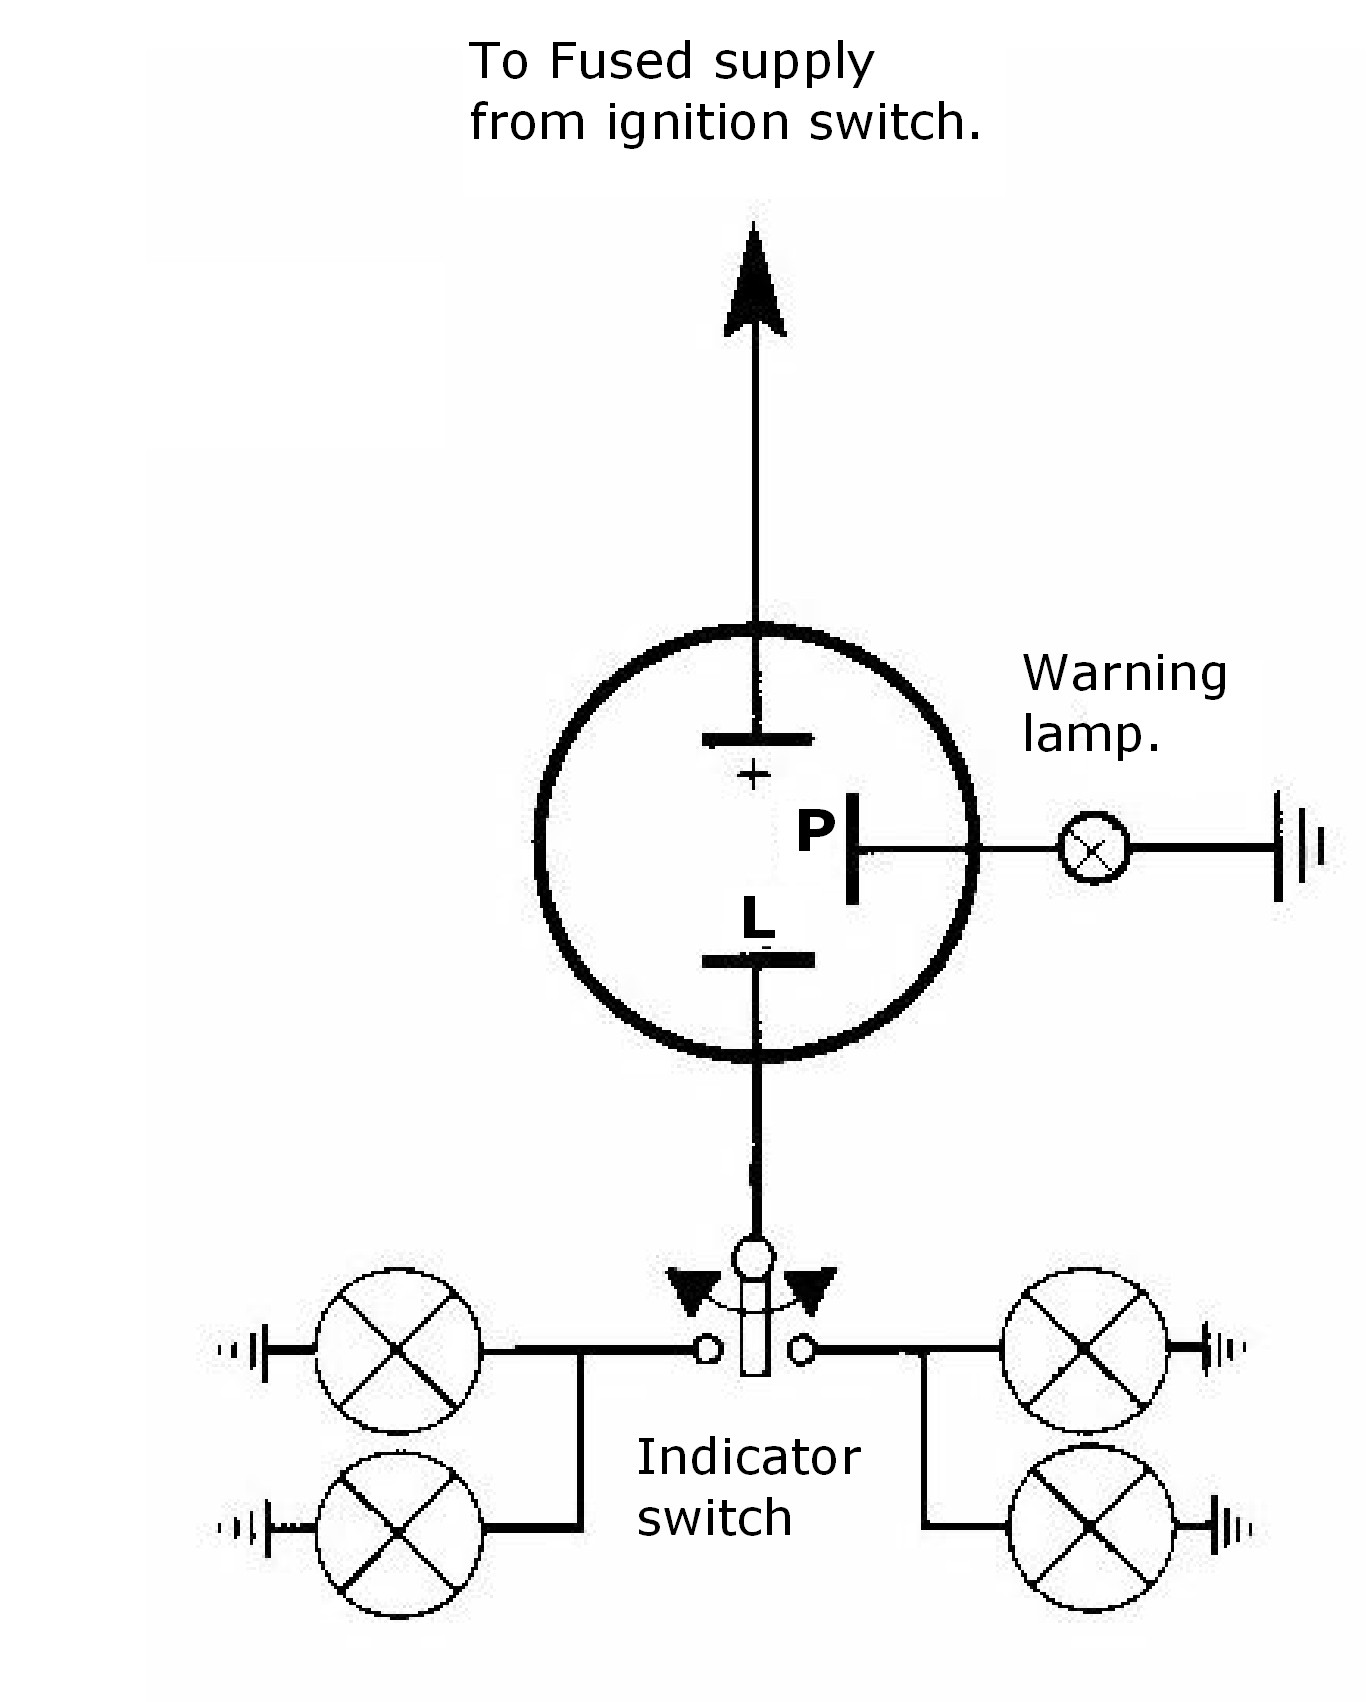 Turn Signal Flasher Relay Wiring Diagram February 2015 – the Racing Rhino